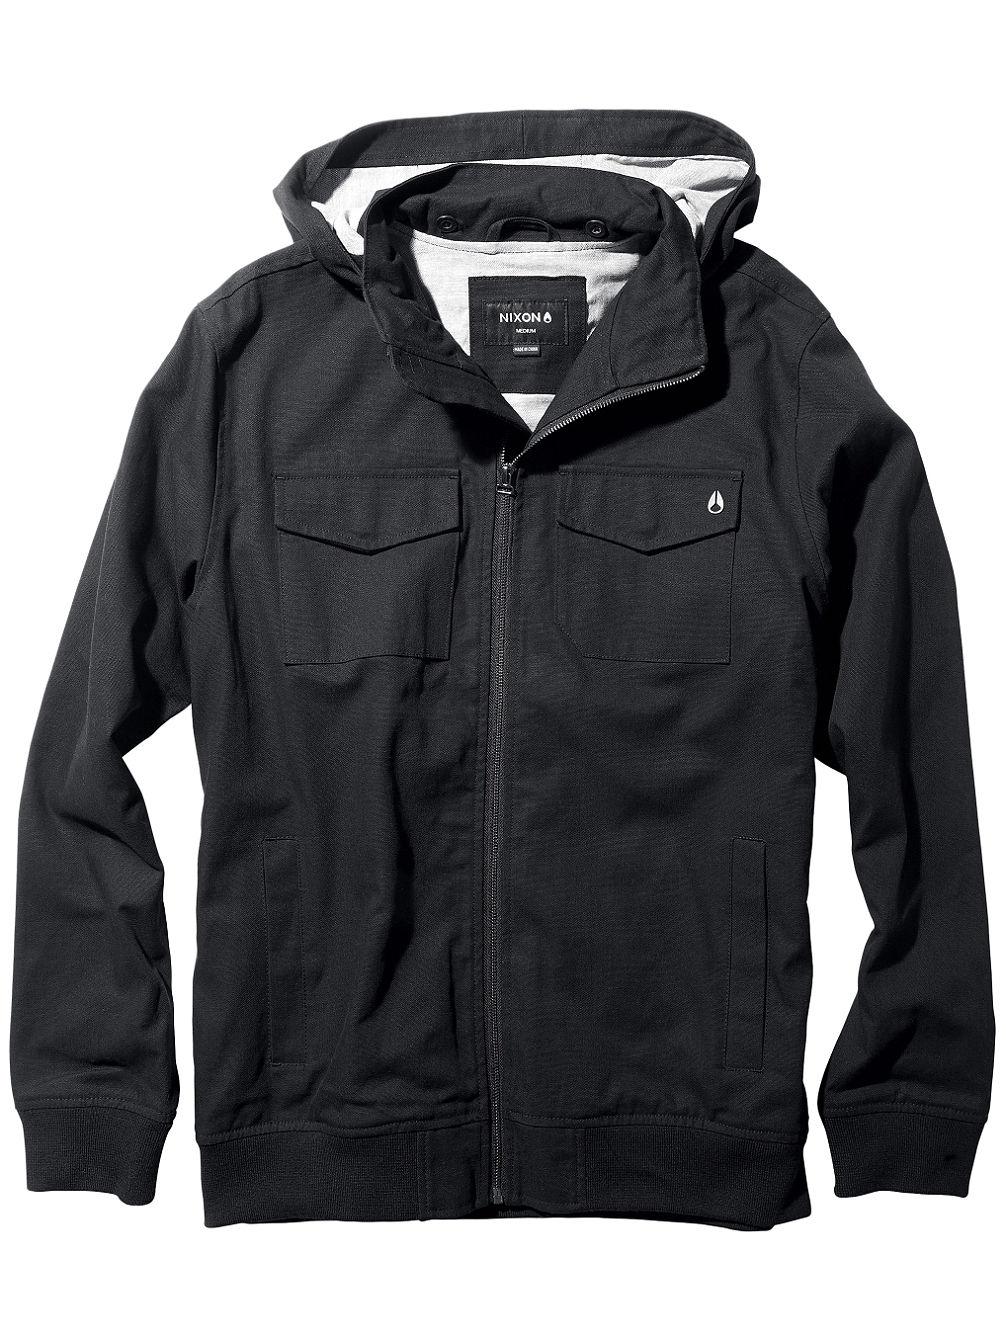 nixon-admiral-jacket